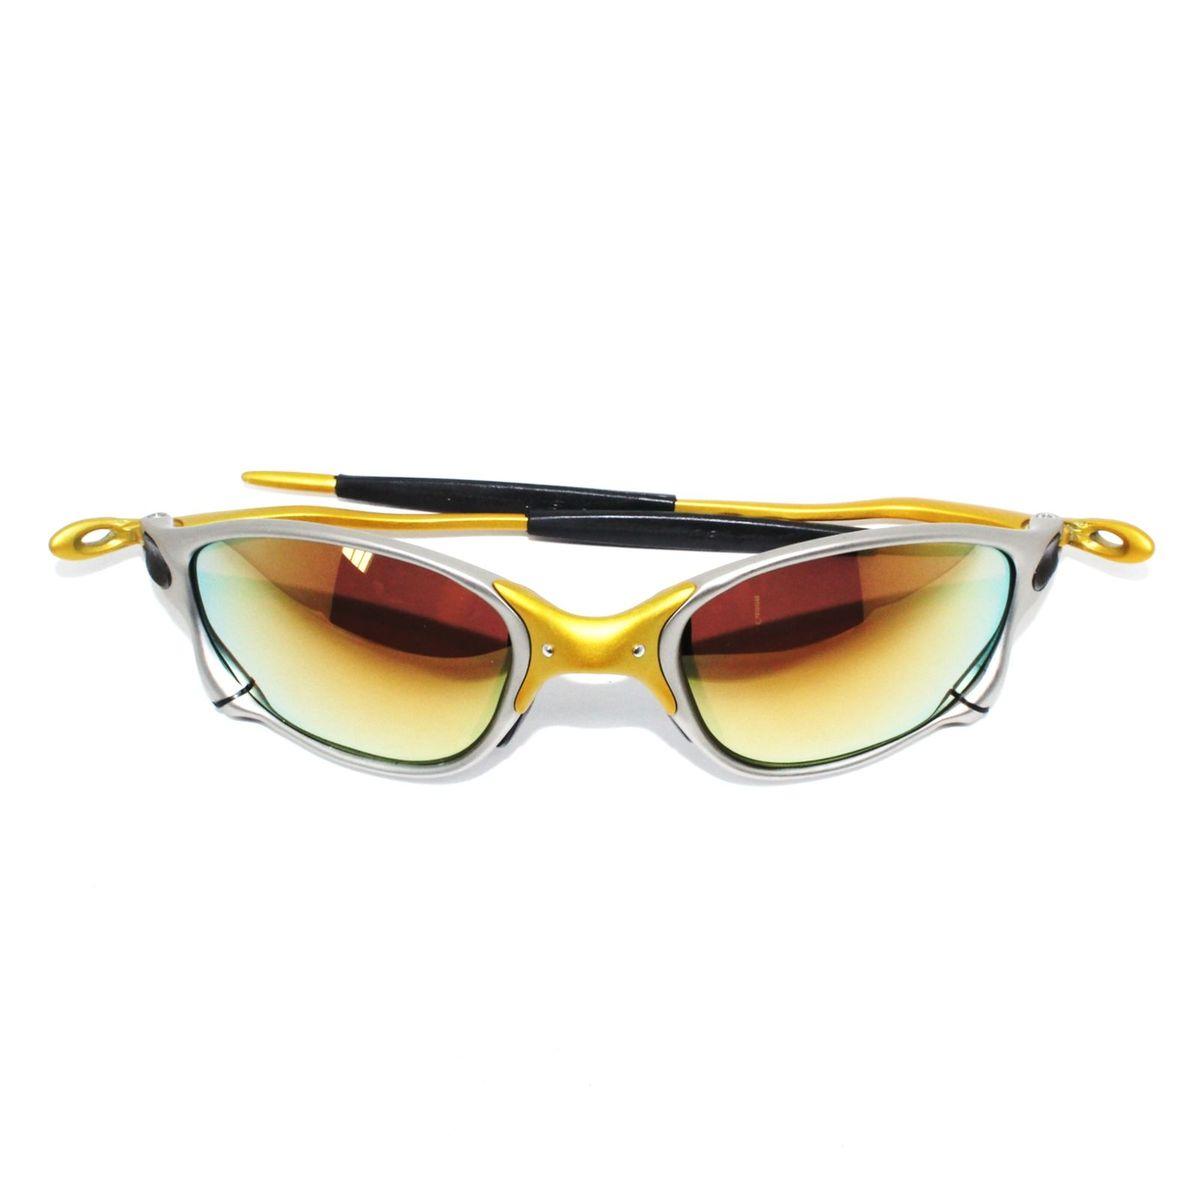 ef474b421 ... d09e51c2e597c óculos oakley juliet romeo 24k x-squared double várias  cores - óculos oakley ...